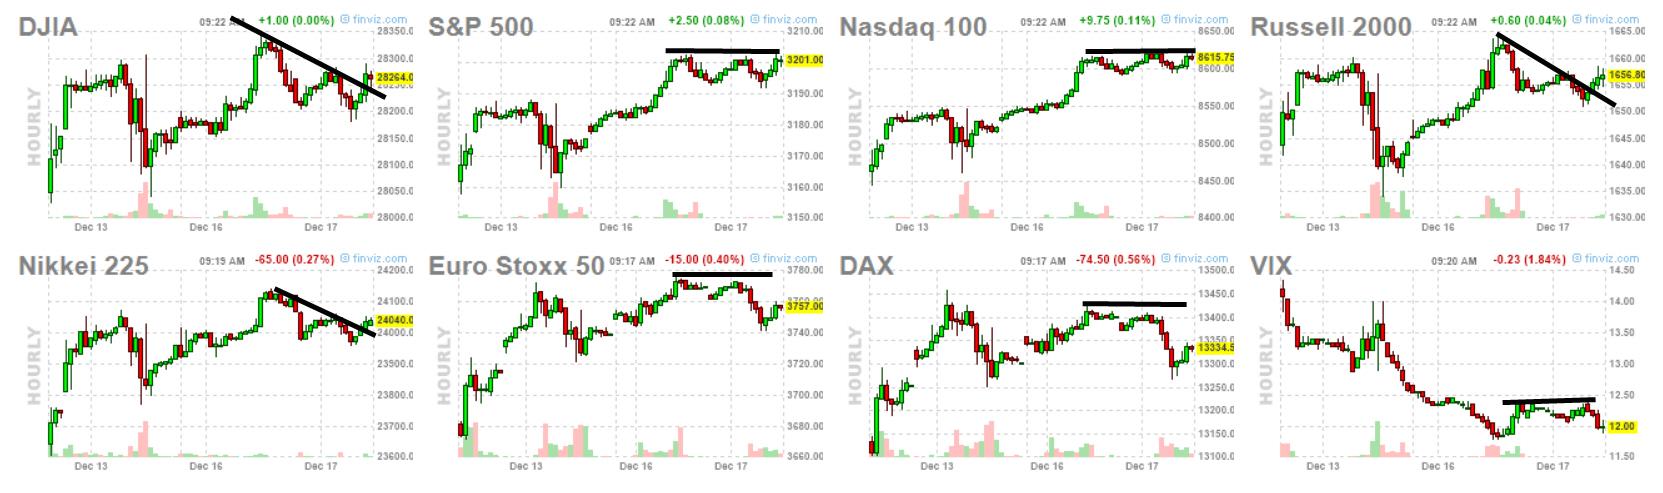 Wall Street sigue a lo suyo